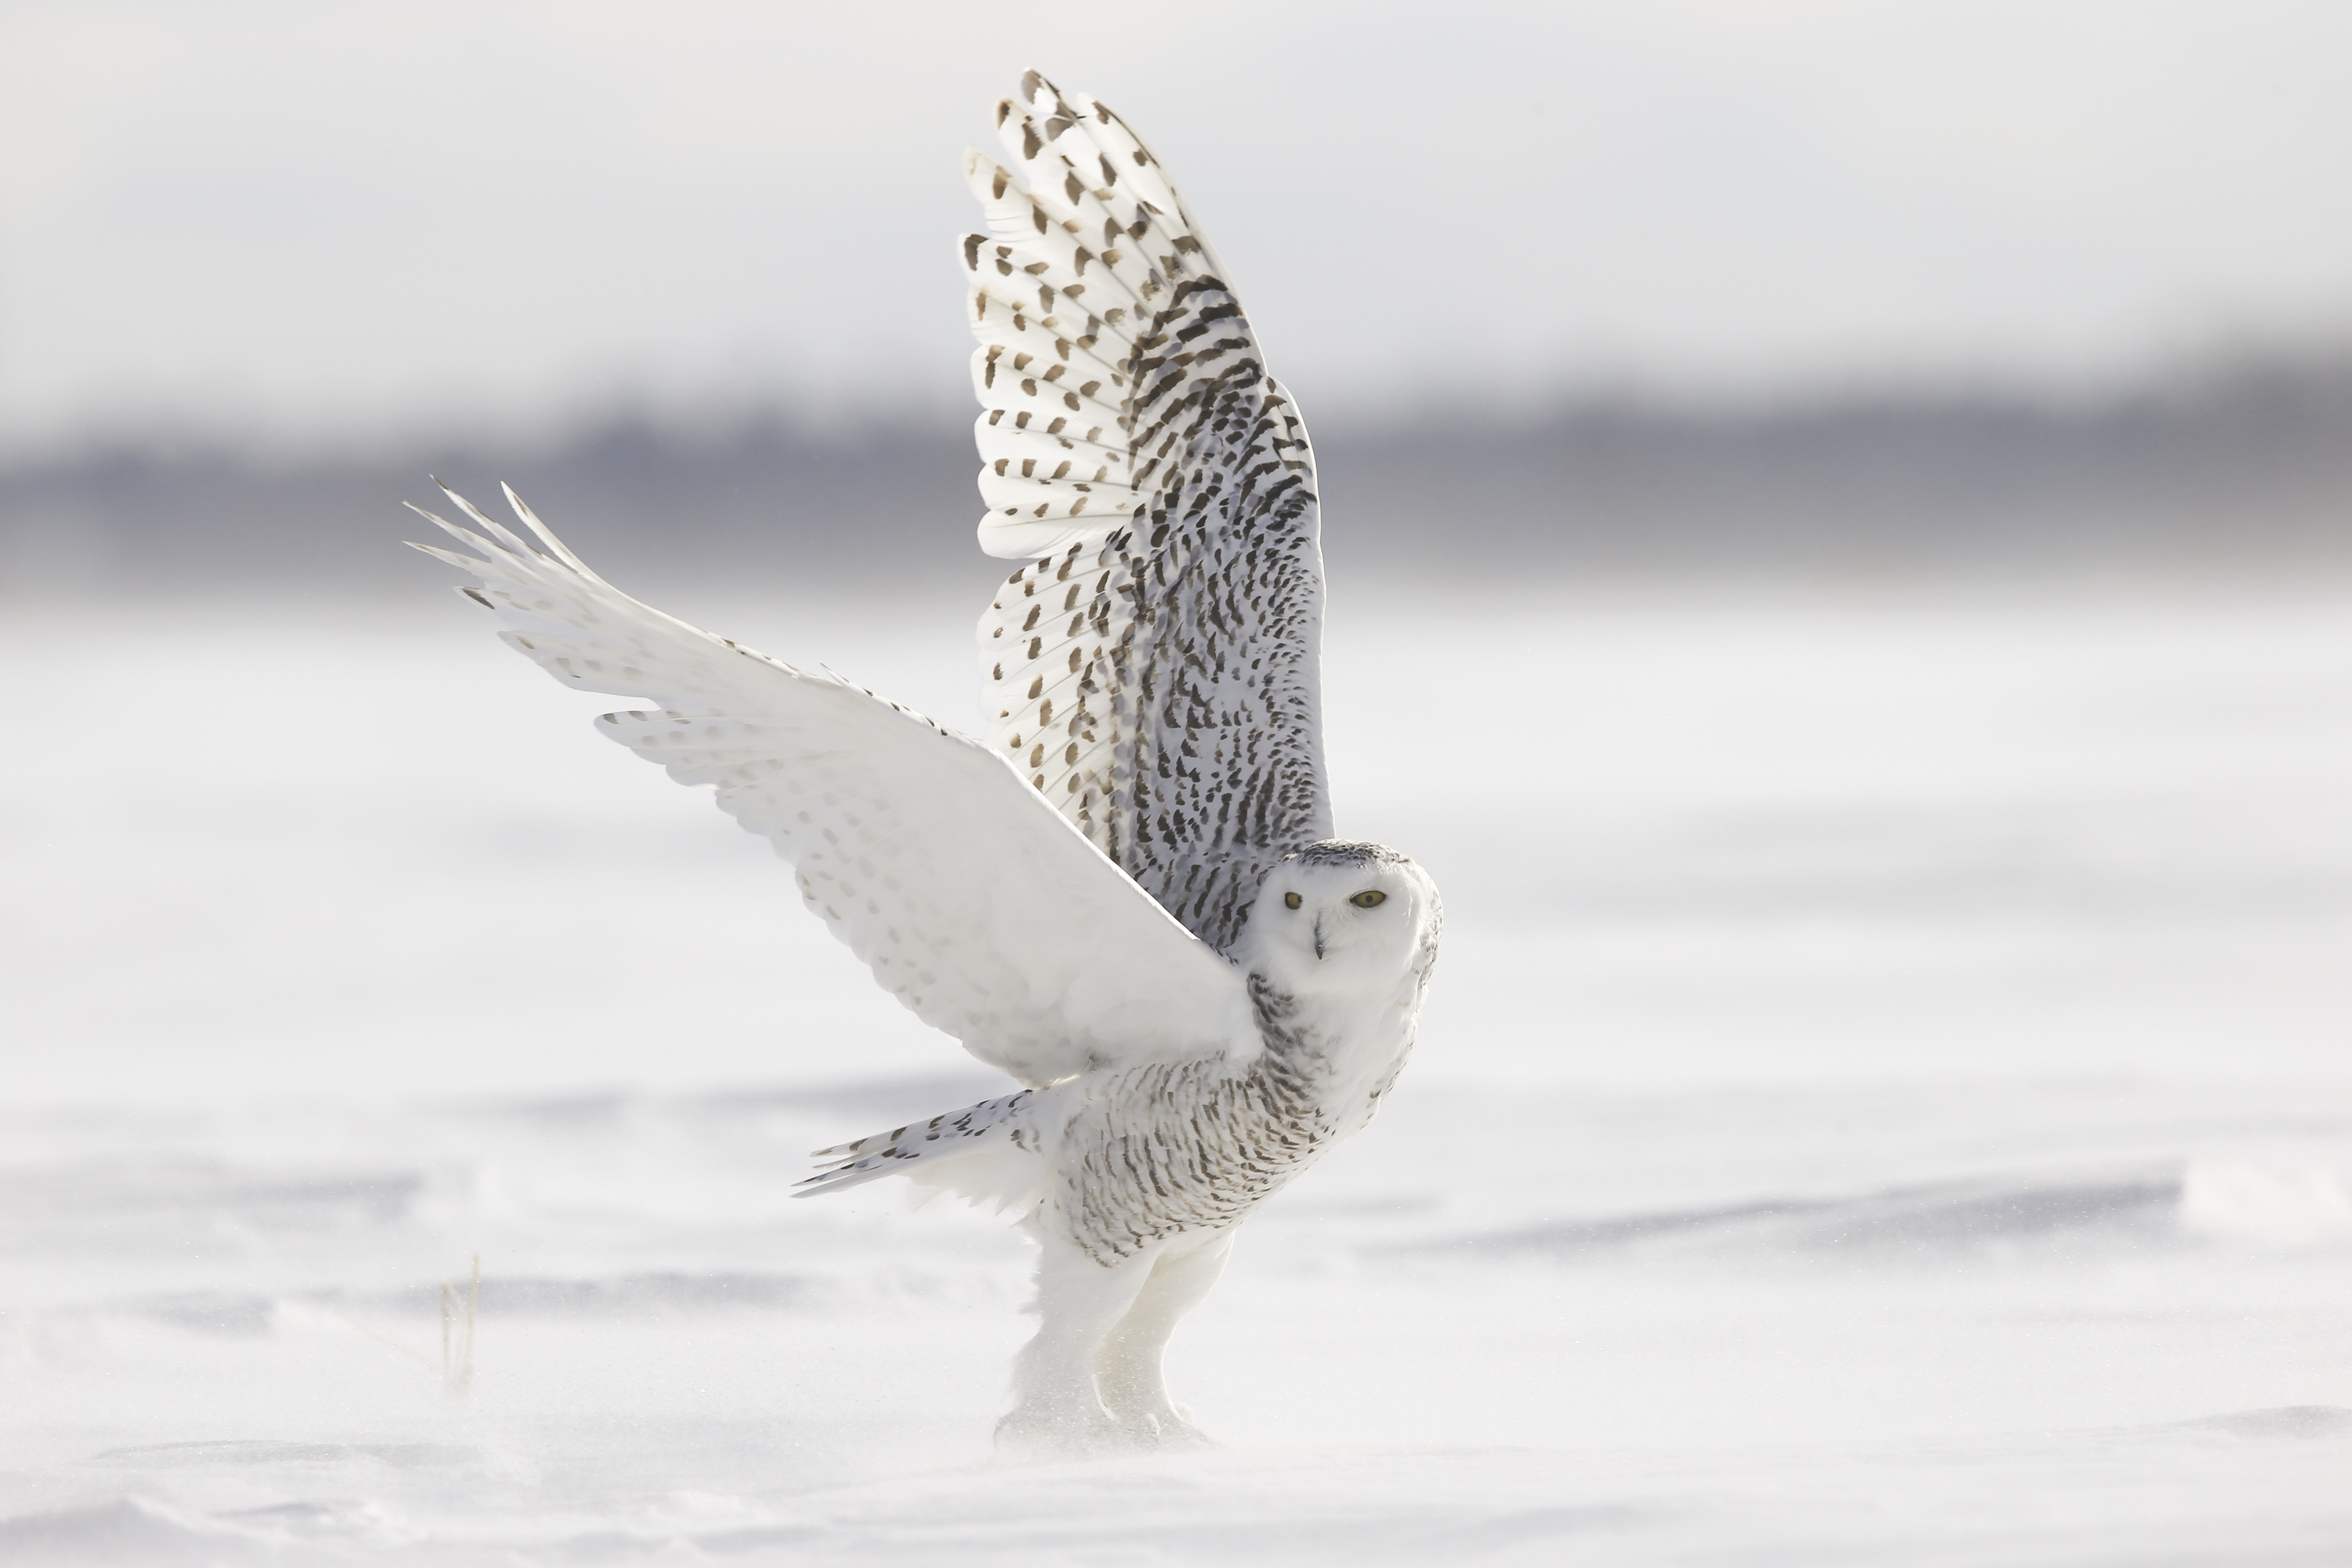 Prêt à attendre Noël ? Canada-Ontario-Chouette-Harfang-des-neiges-Photo-Michel-Rawicki